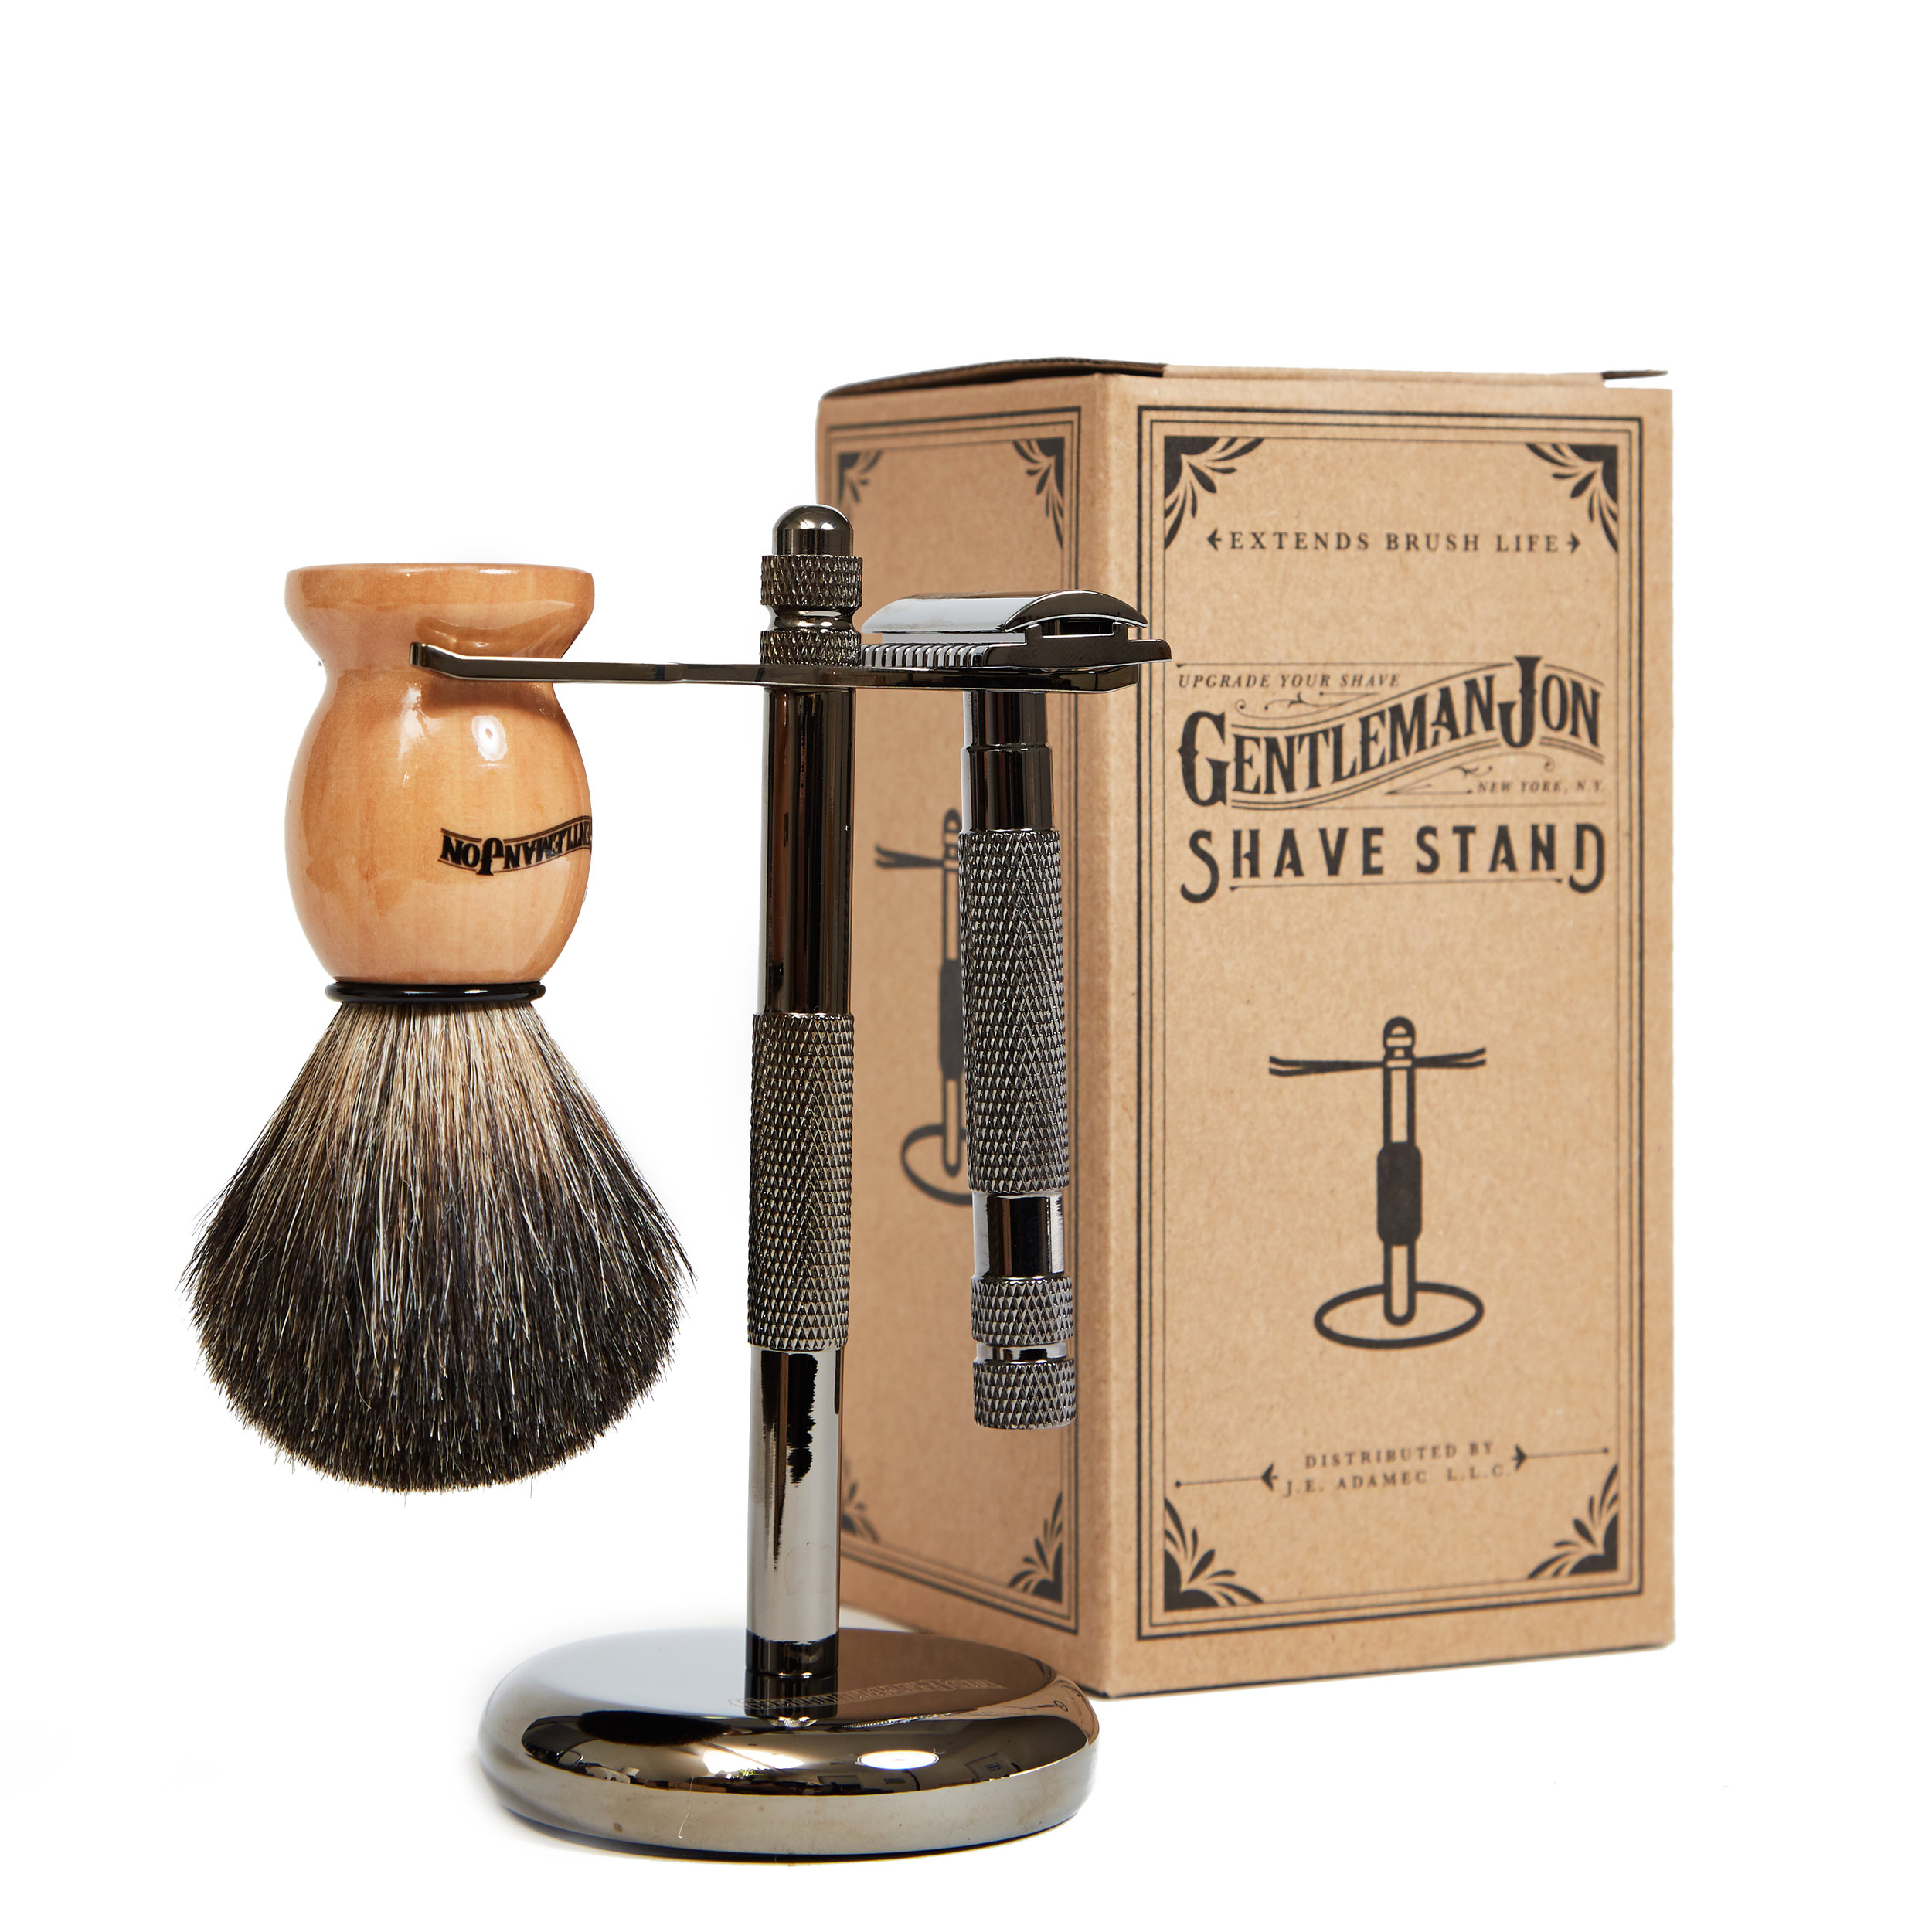 Mastline_Product_Shaving_Stand-1-3100.jpg